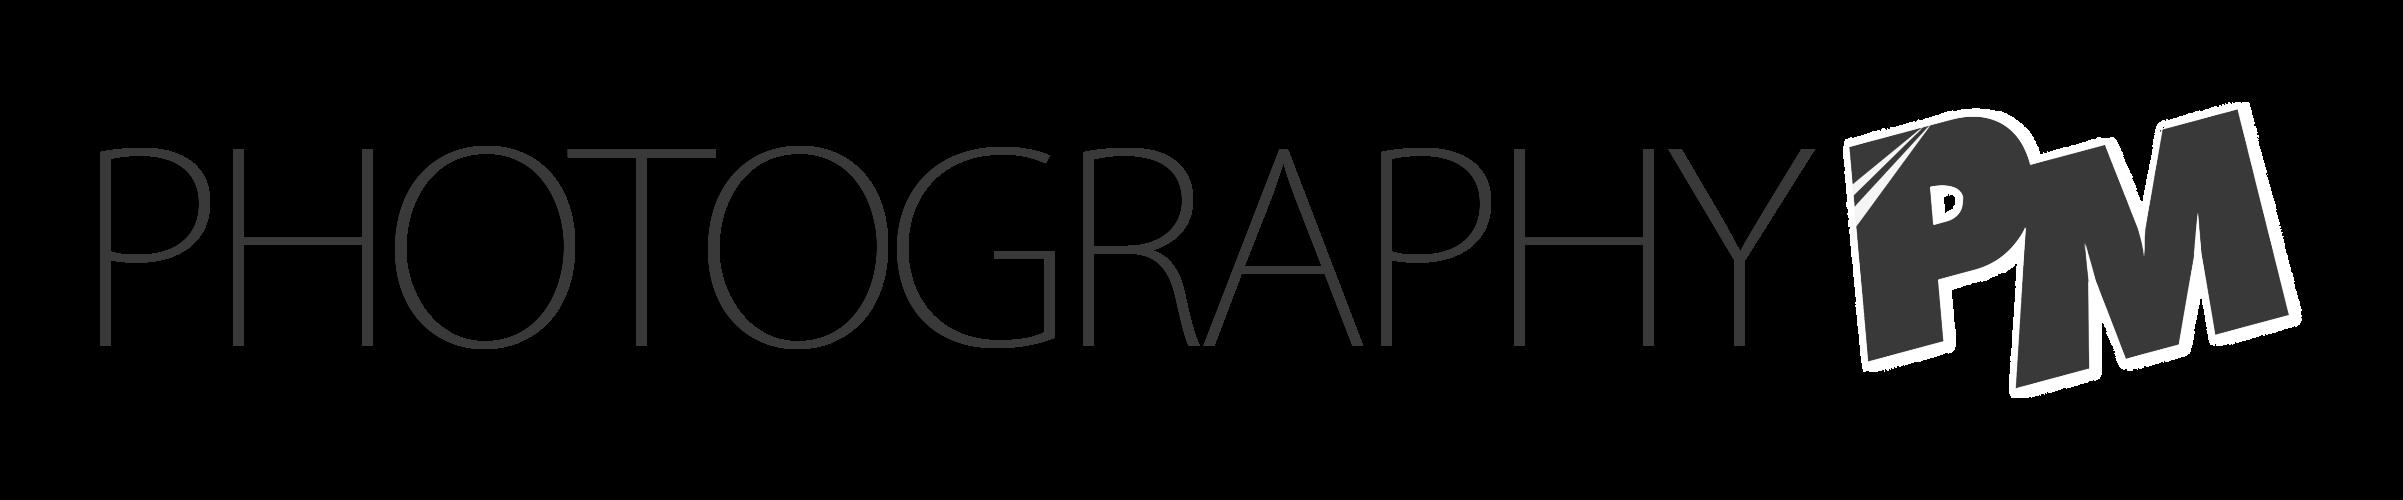 Logo PhotographyPM 1